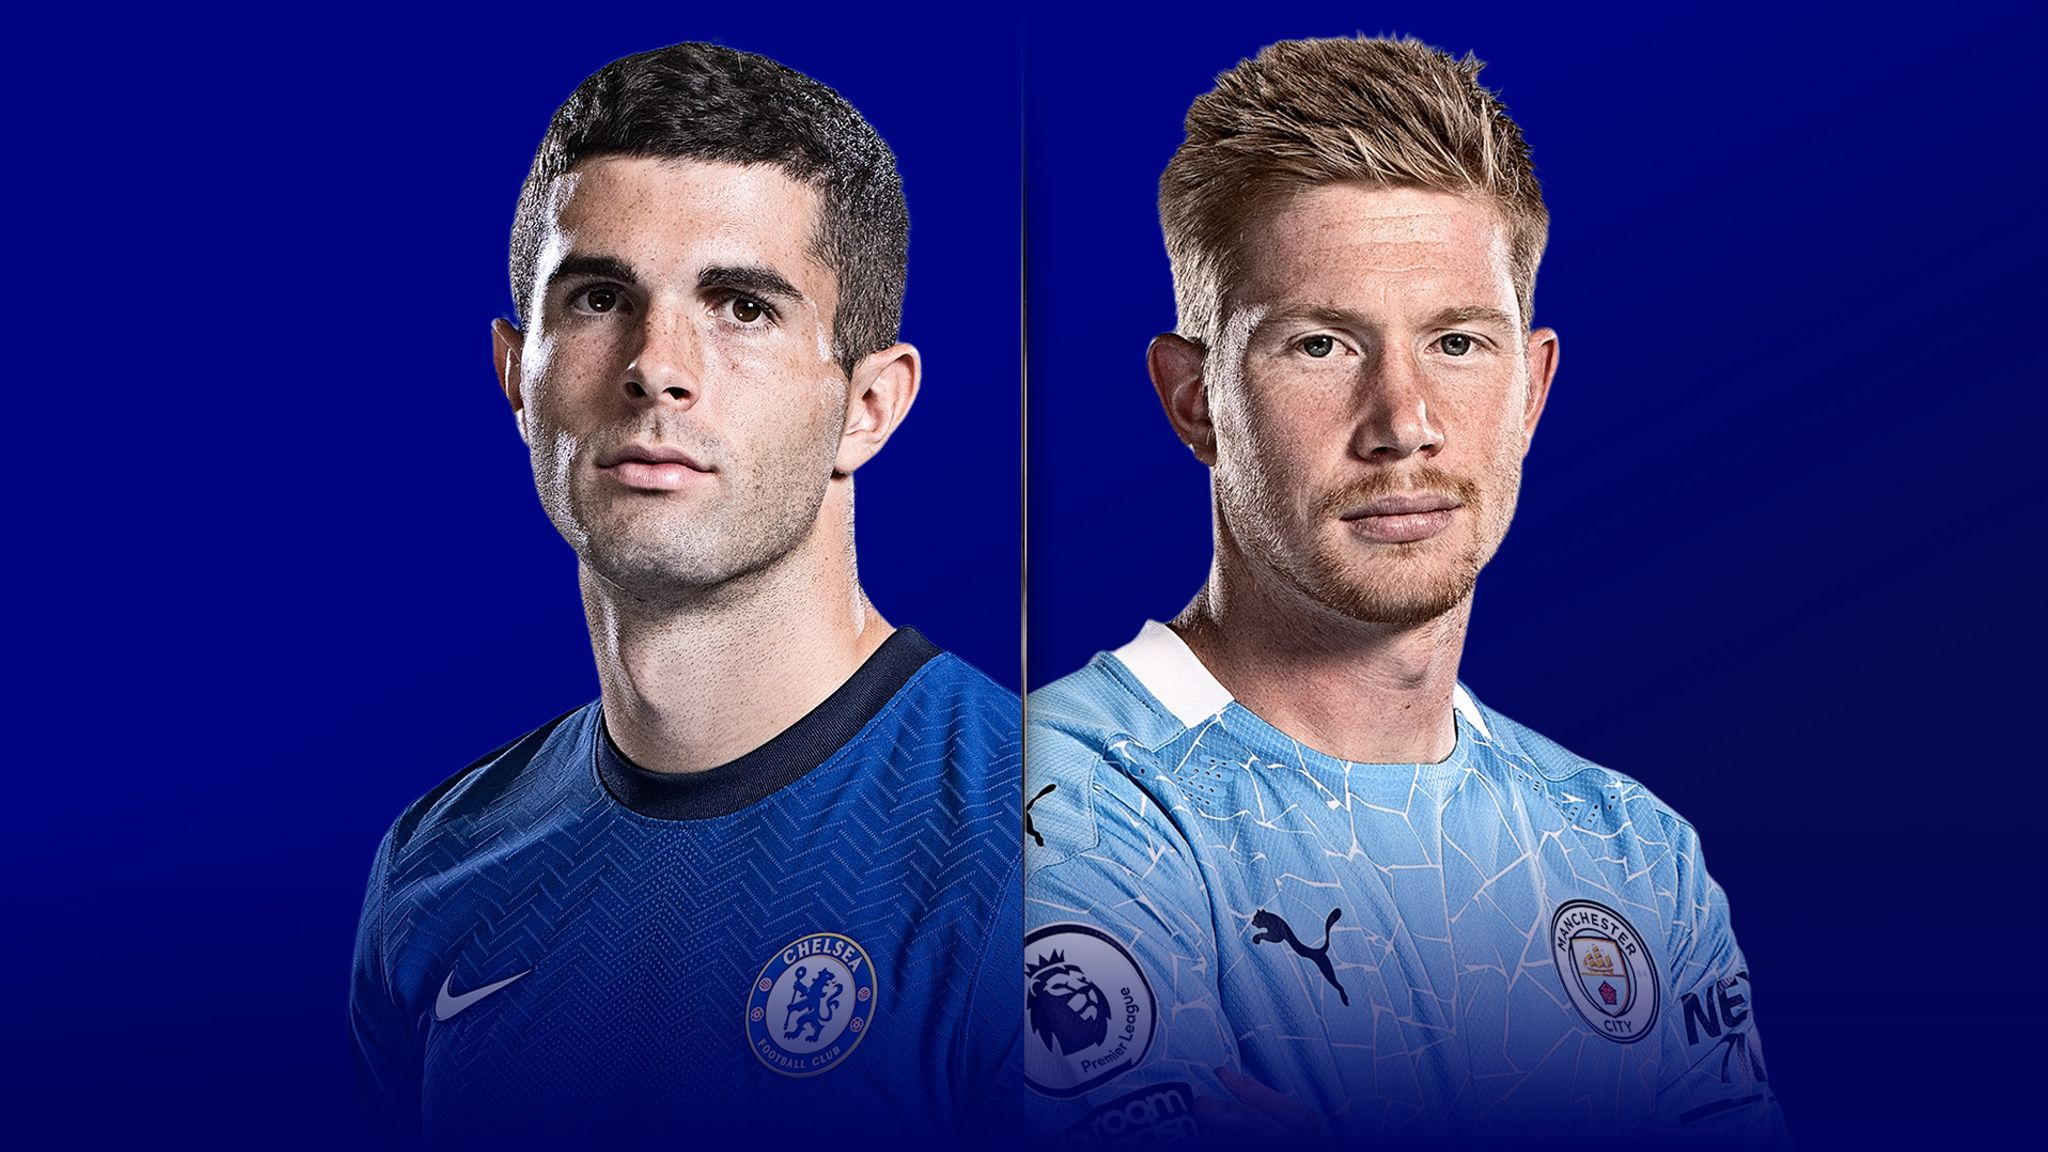 Live match preview - Chelsea vs Man City 03.01.2021